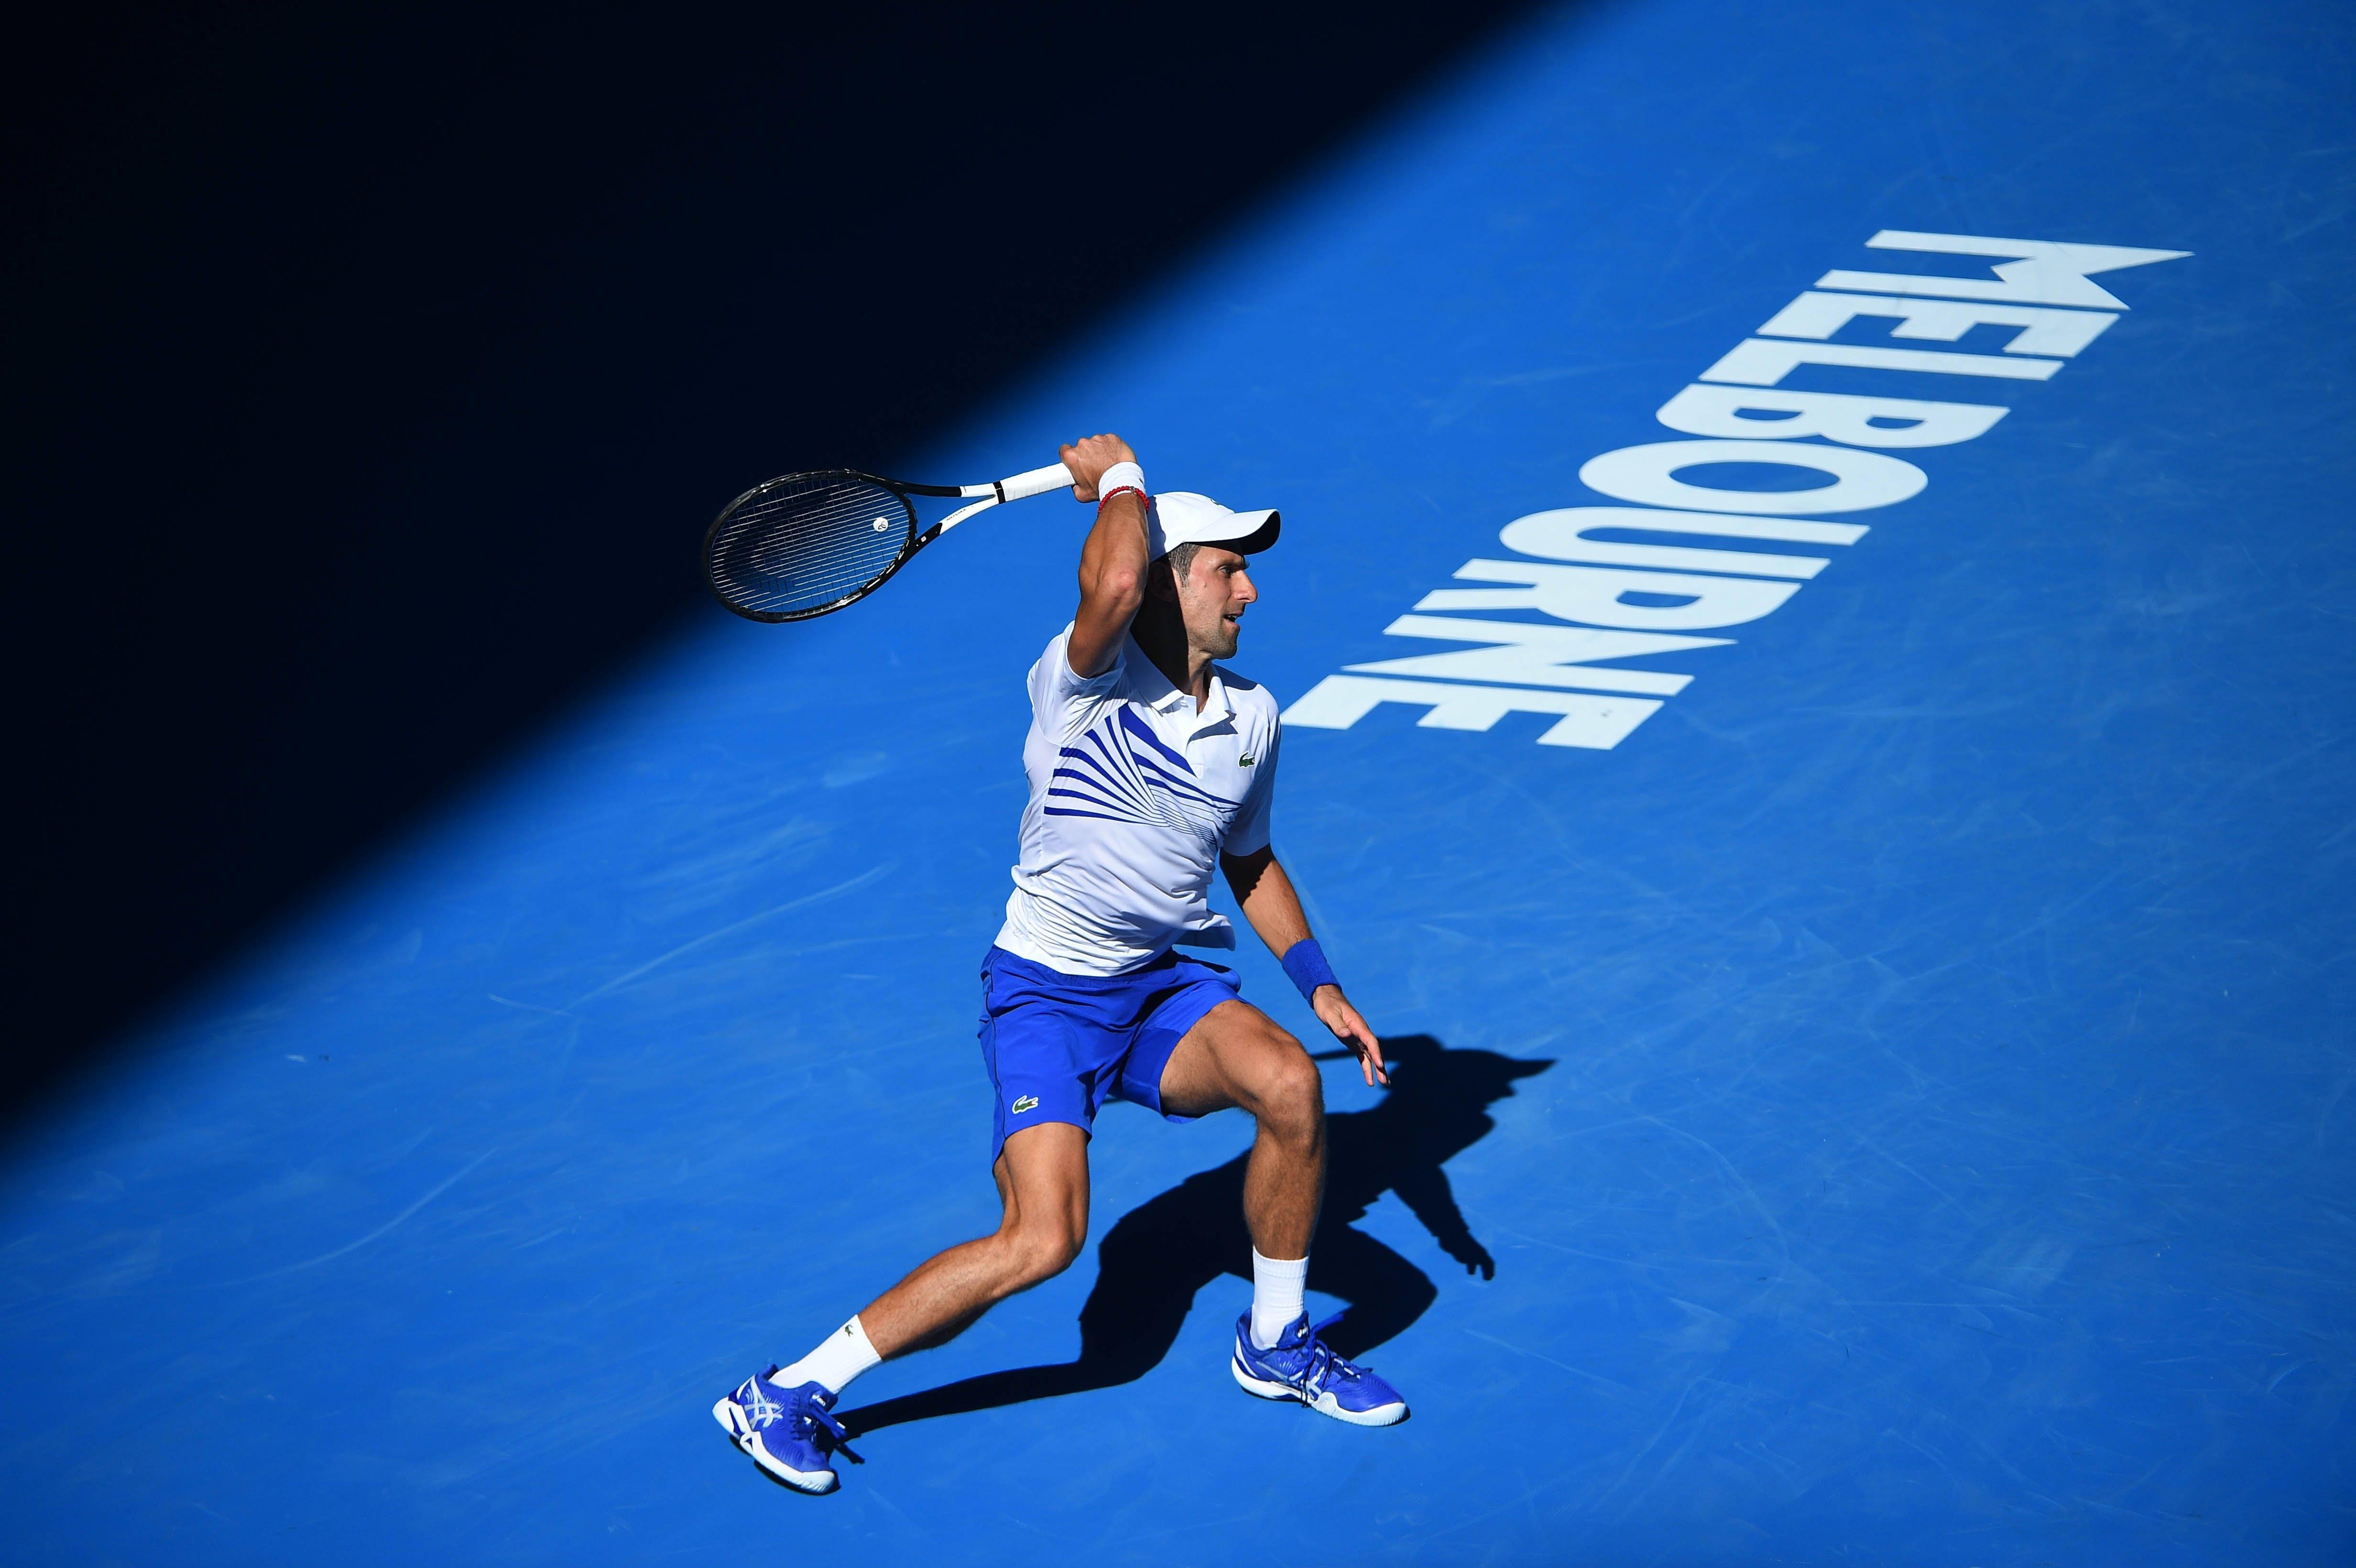 Novak Djokovic during his third round match at the Australian Open 2019